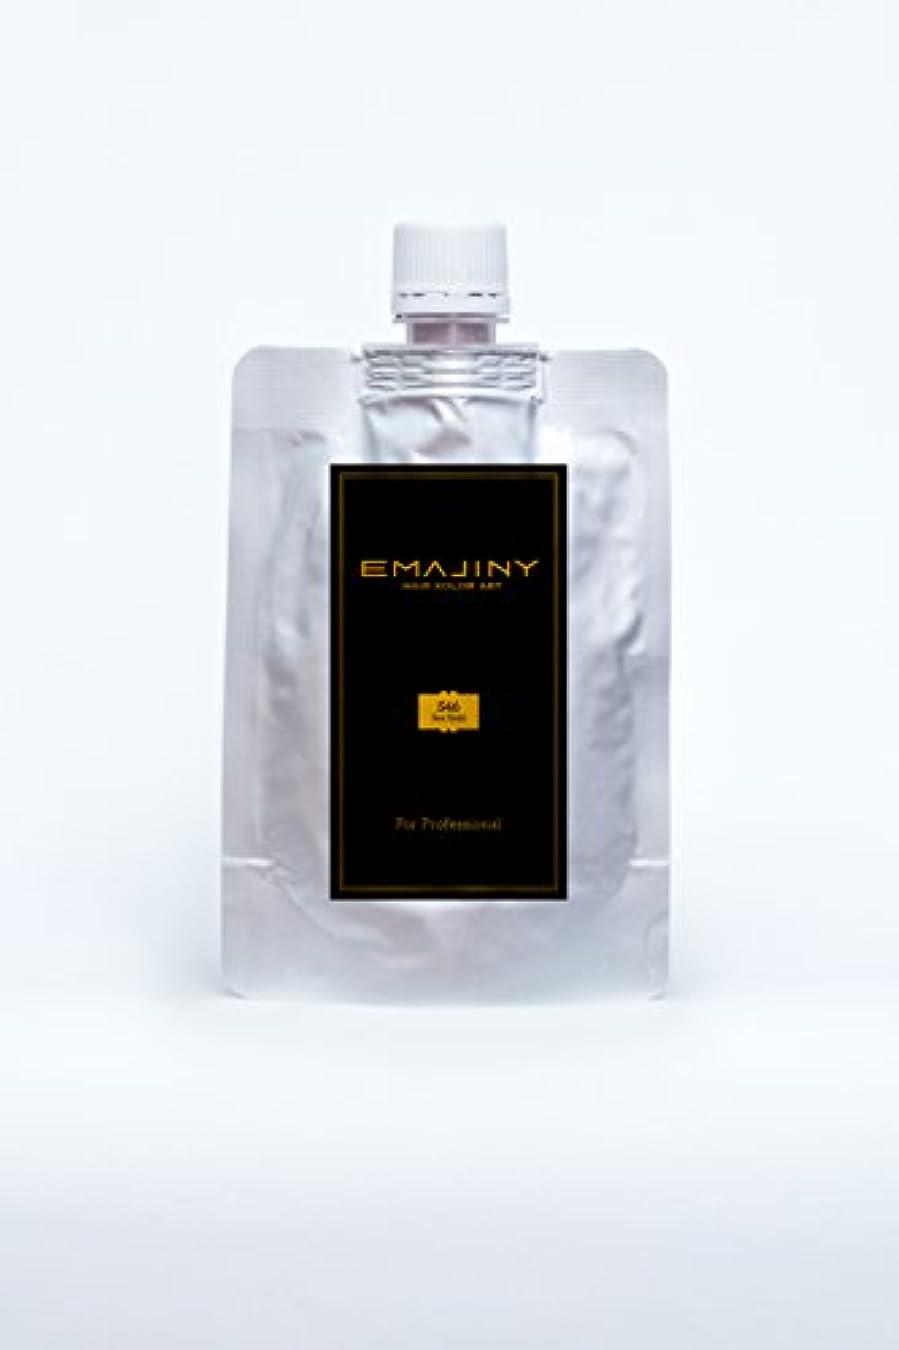 EMAJINY Sax Gold S46(ゴールドカラーワックス)金プロフェッショナル100g大容量パック【日本製】【無香料】